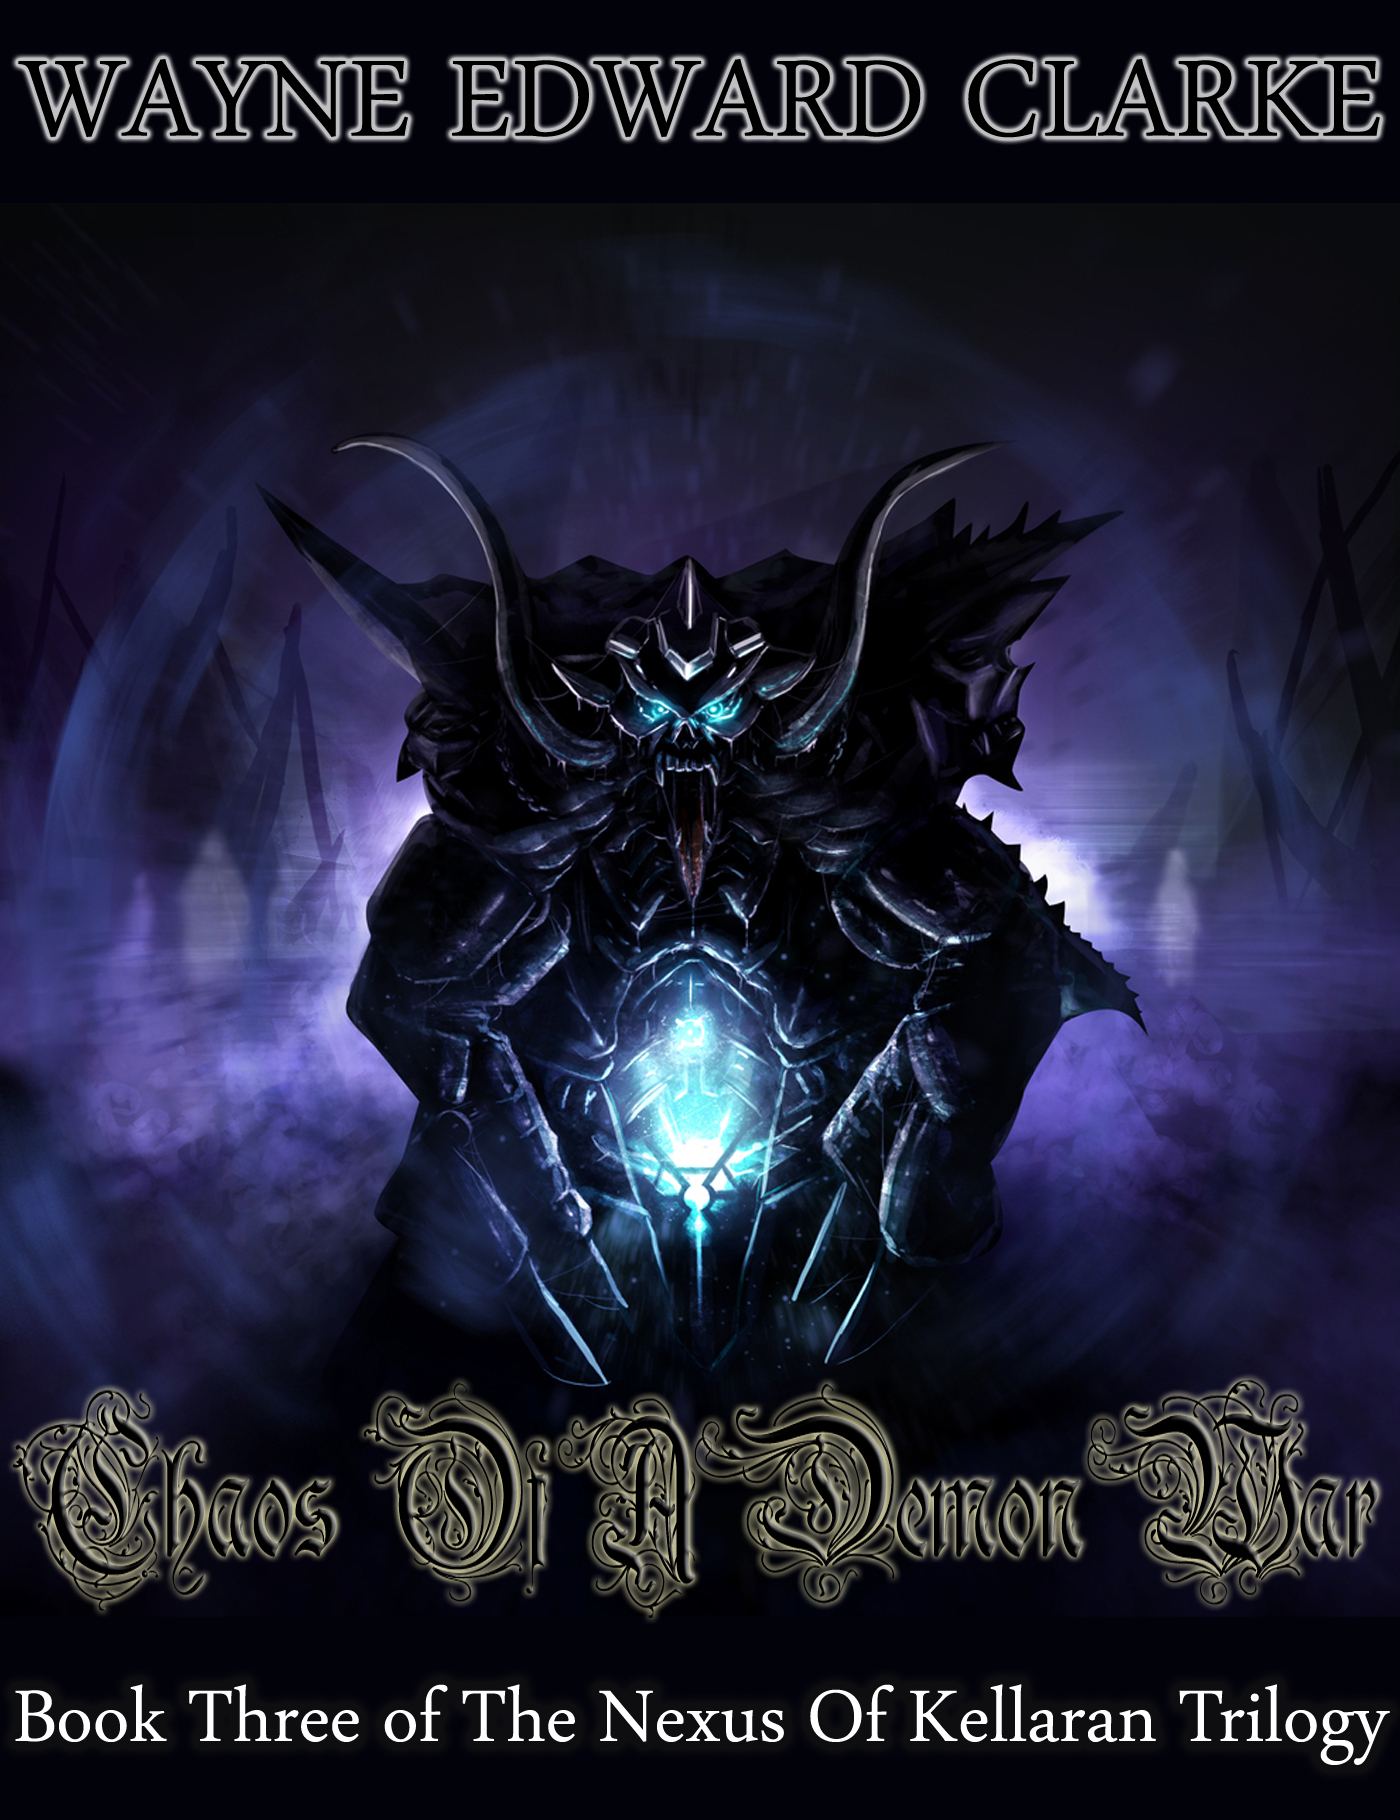 Chaos Of A Demon War: Book Three of The Nexus Of Kellaran Trilogy - USA Edition  by  Wayne Edward Clarke